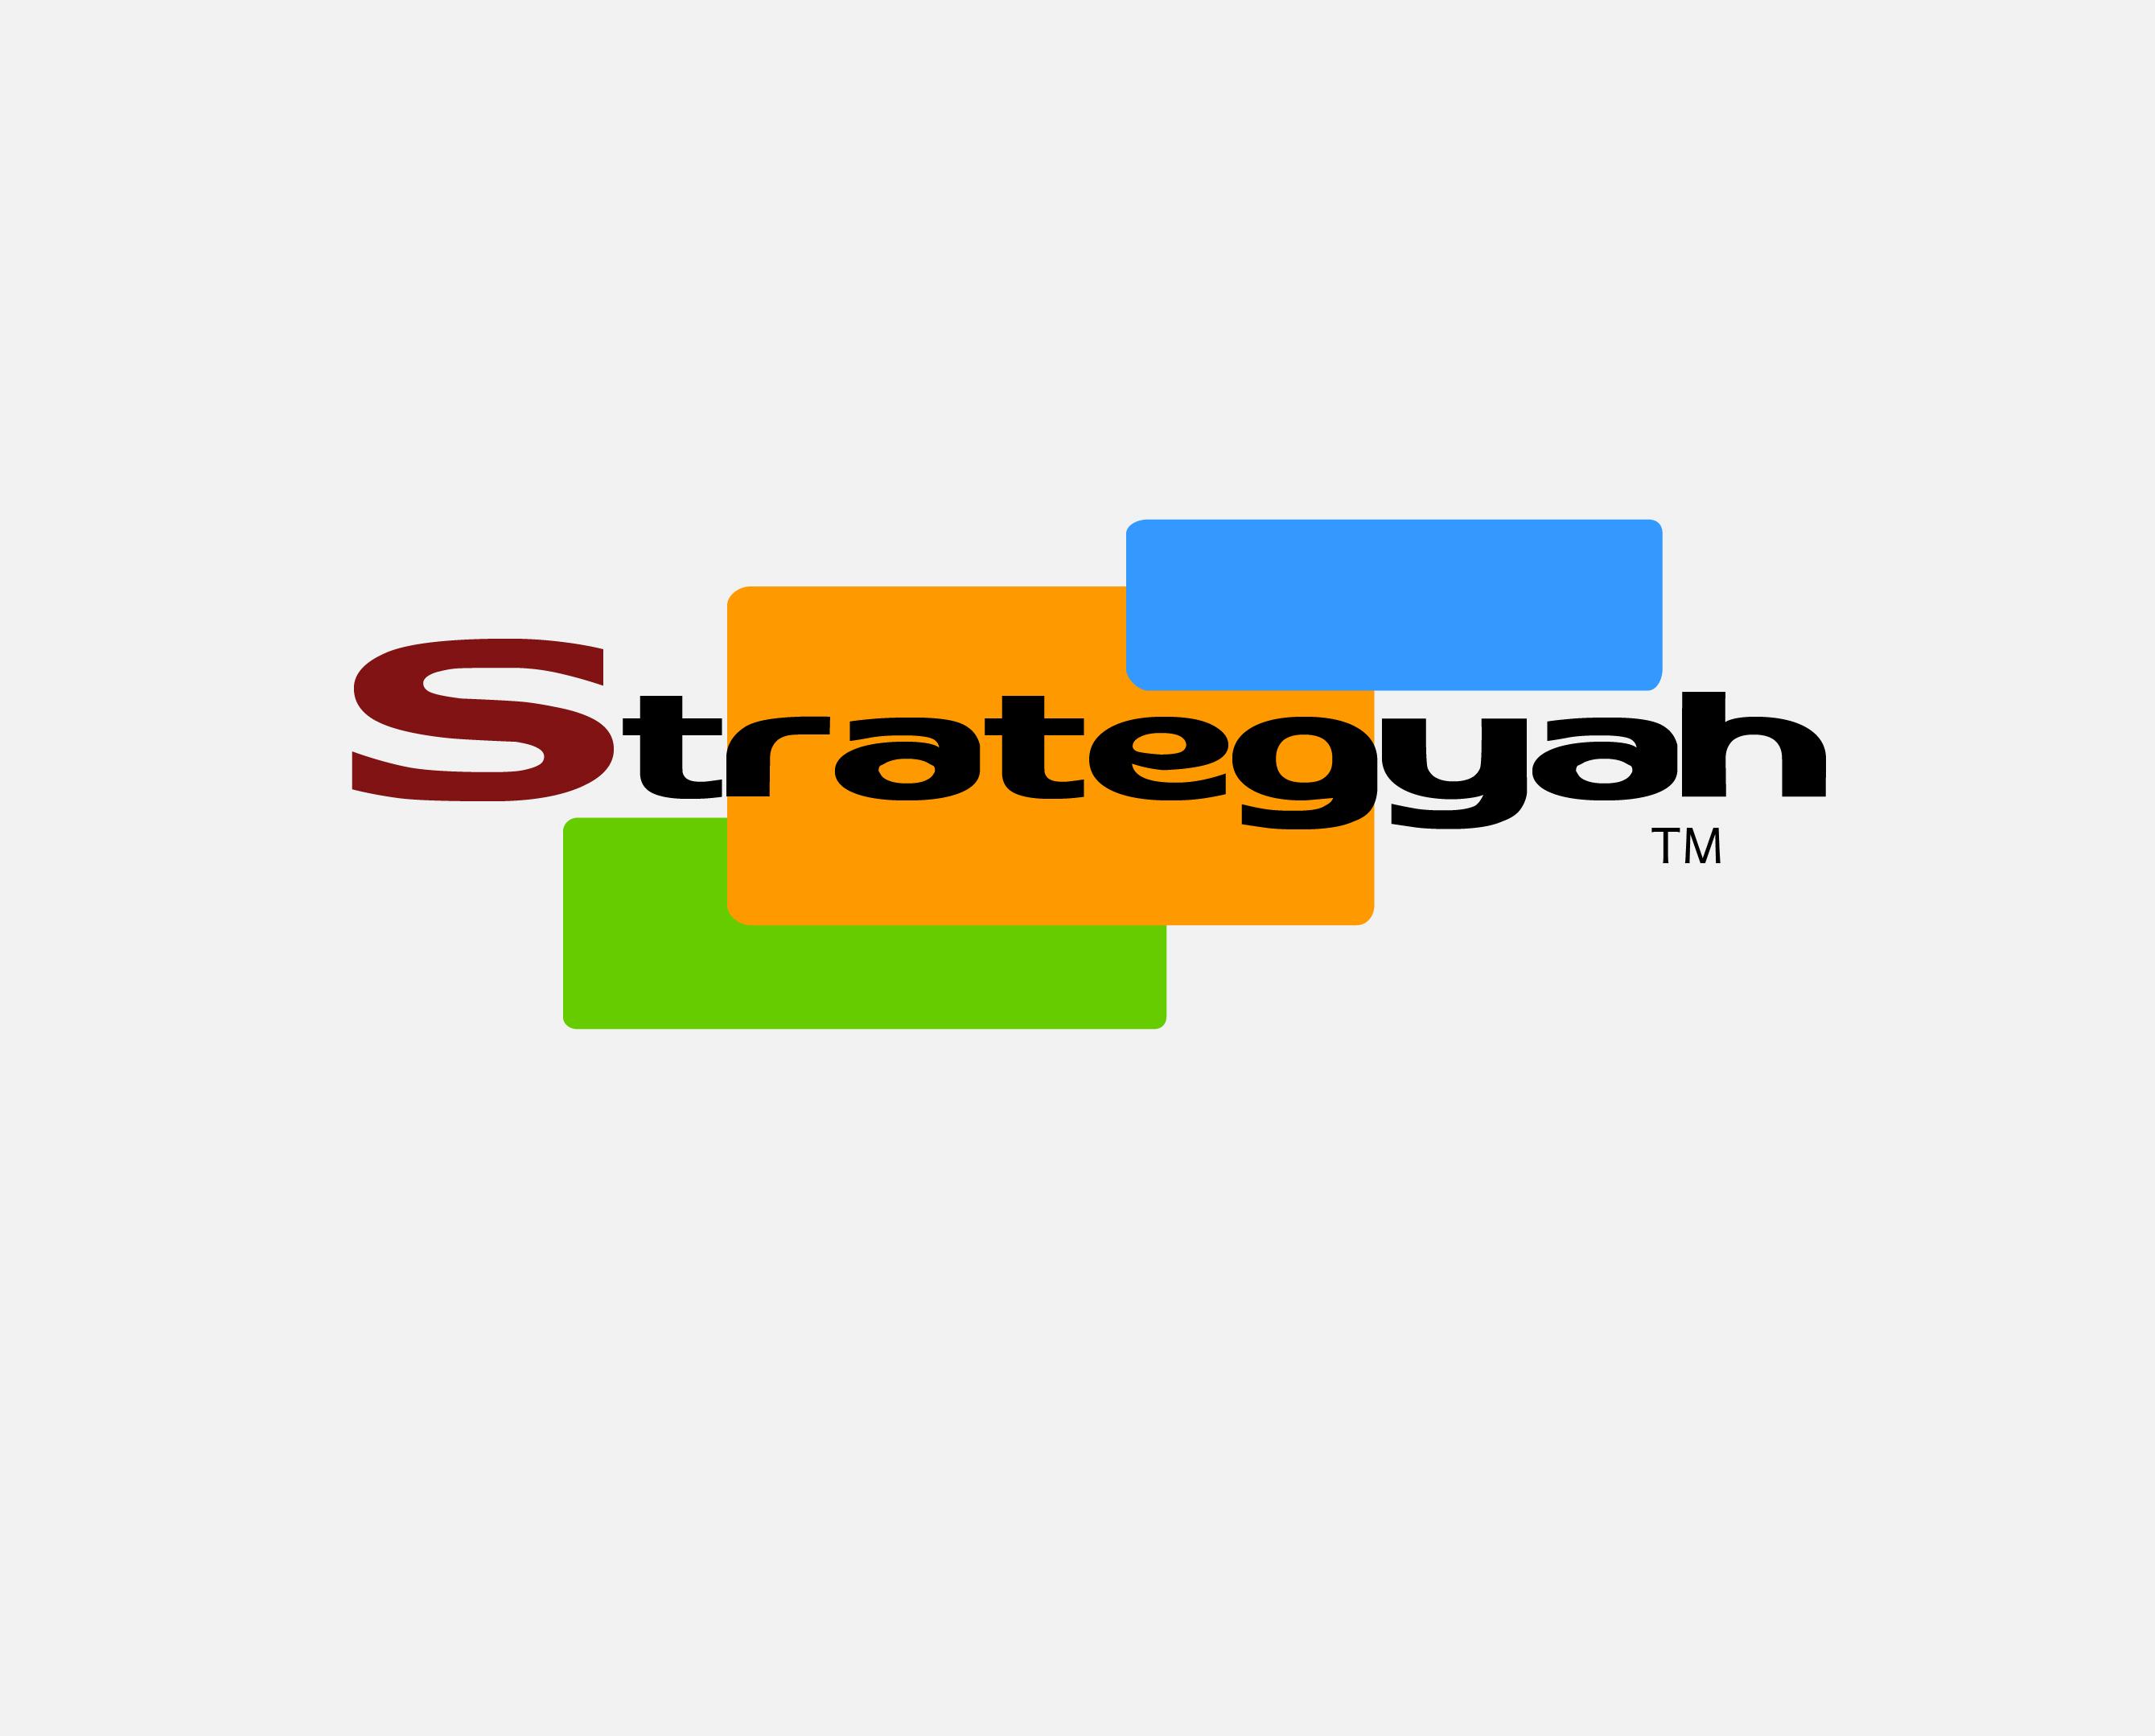 Logo Design by Nancy Grant - Entry No. 88 in the Logo Design Contest Creative Logo Design for Strategyah.